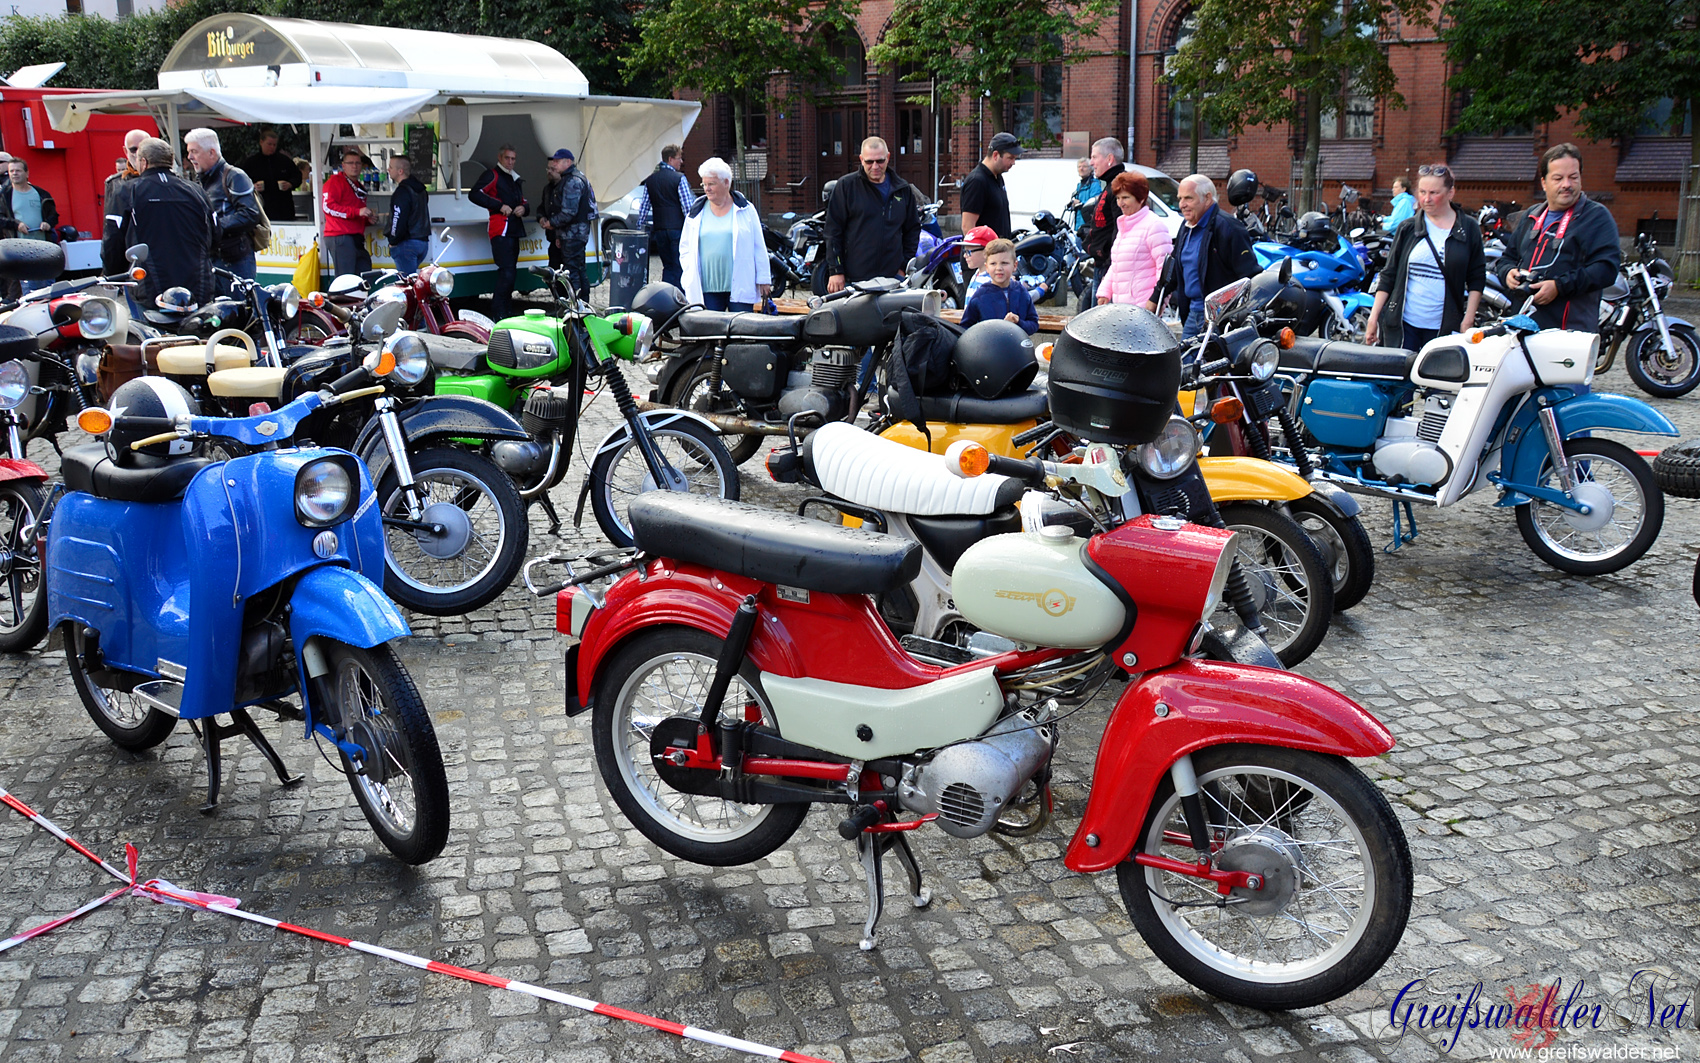 MoGo 2017 - Motorradgottesdienst in Greifswald